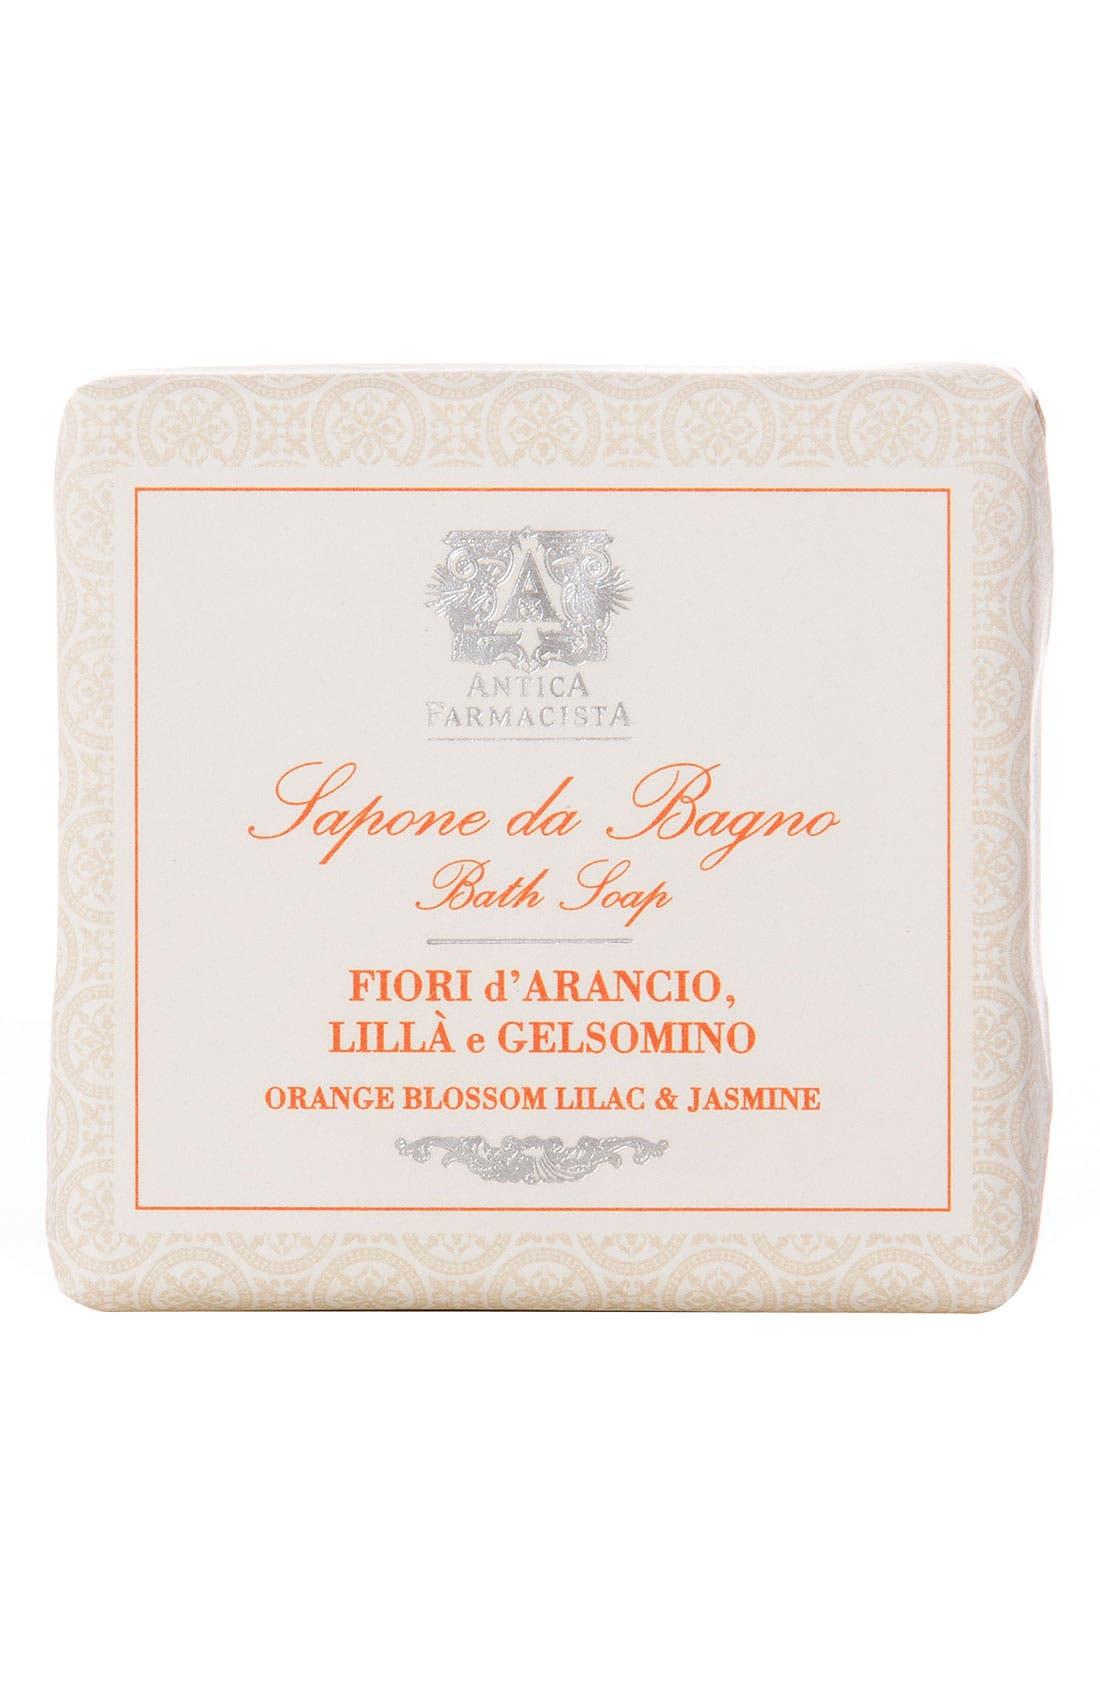 'Orange Blossom, Lilac & Jasmine' Bar Soap,                             Main thumbnail 1, color,                             000